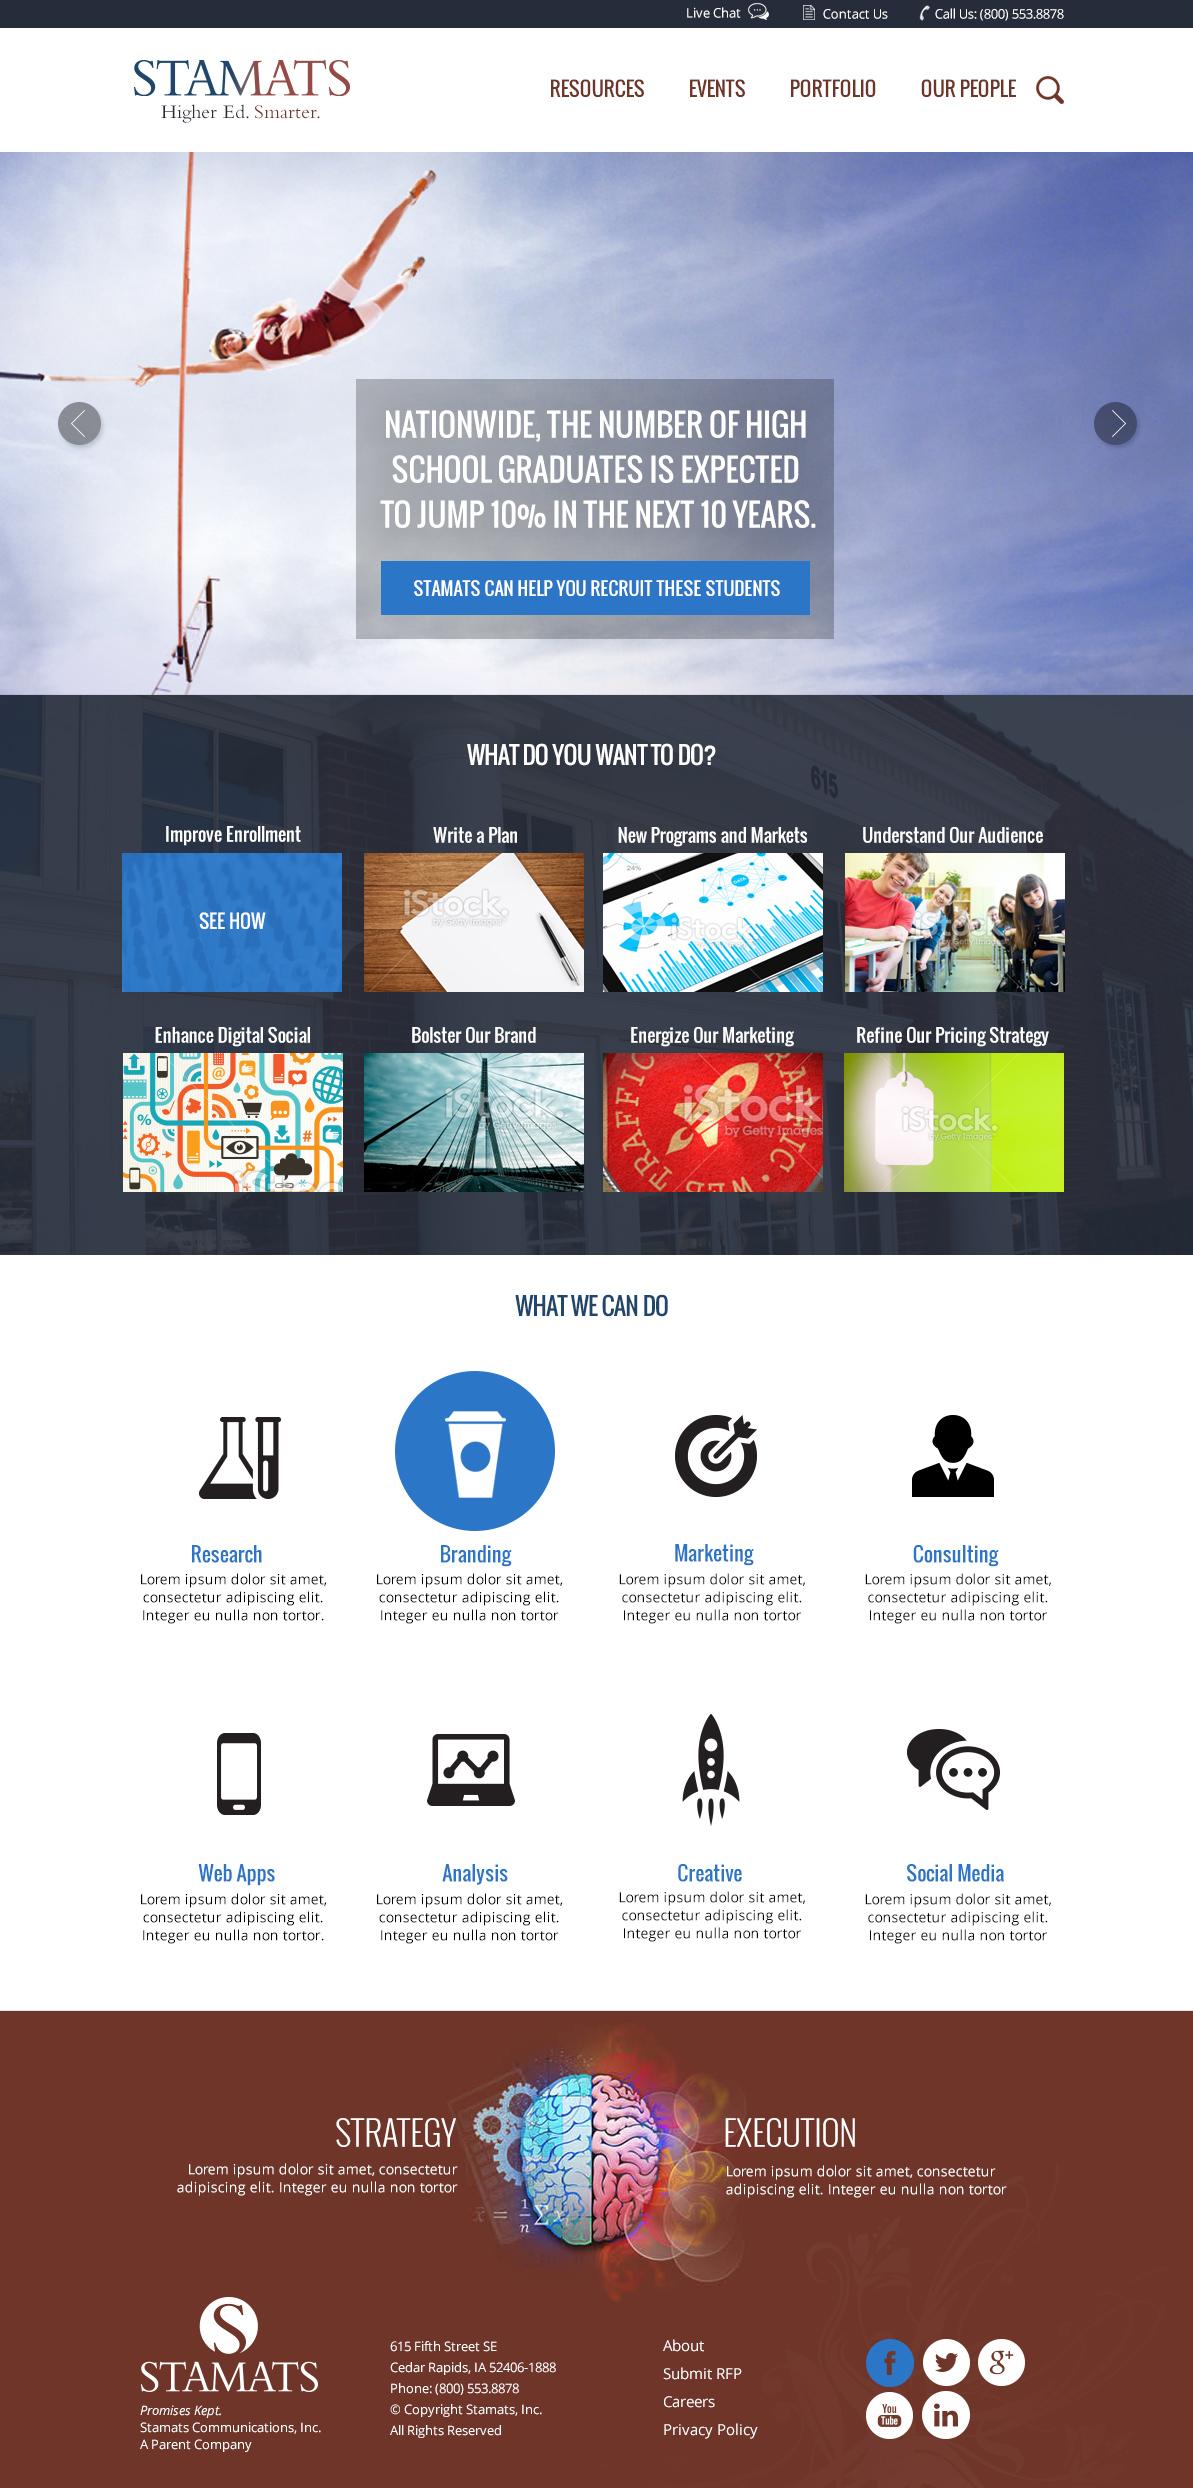 STAMATS-Homepage-960